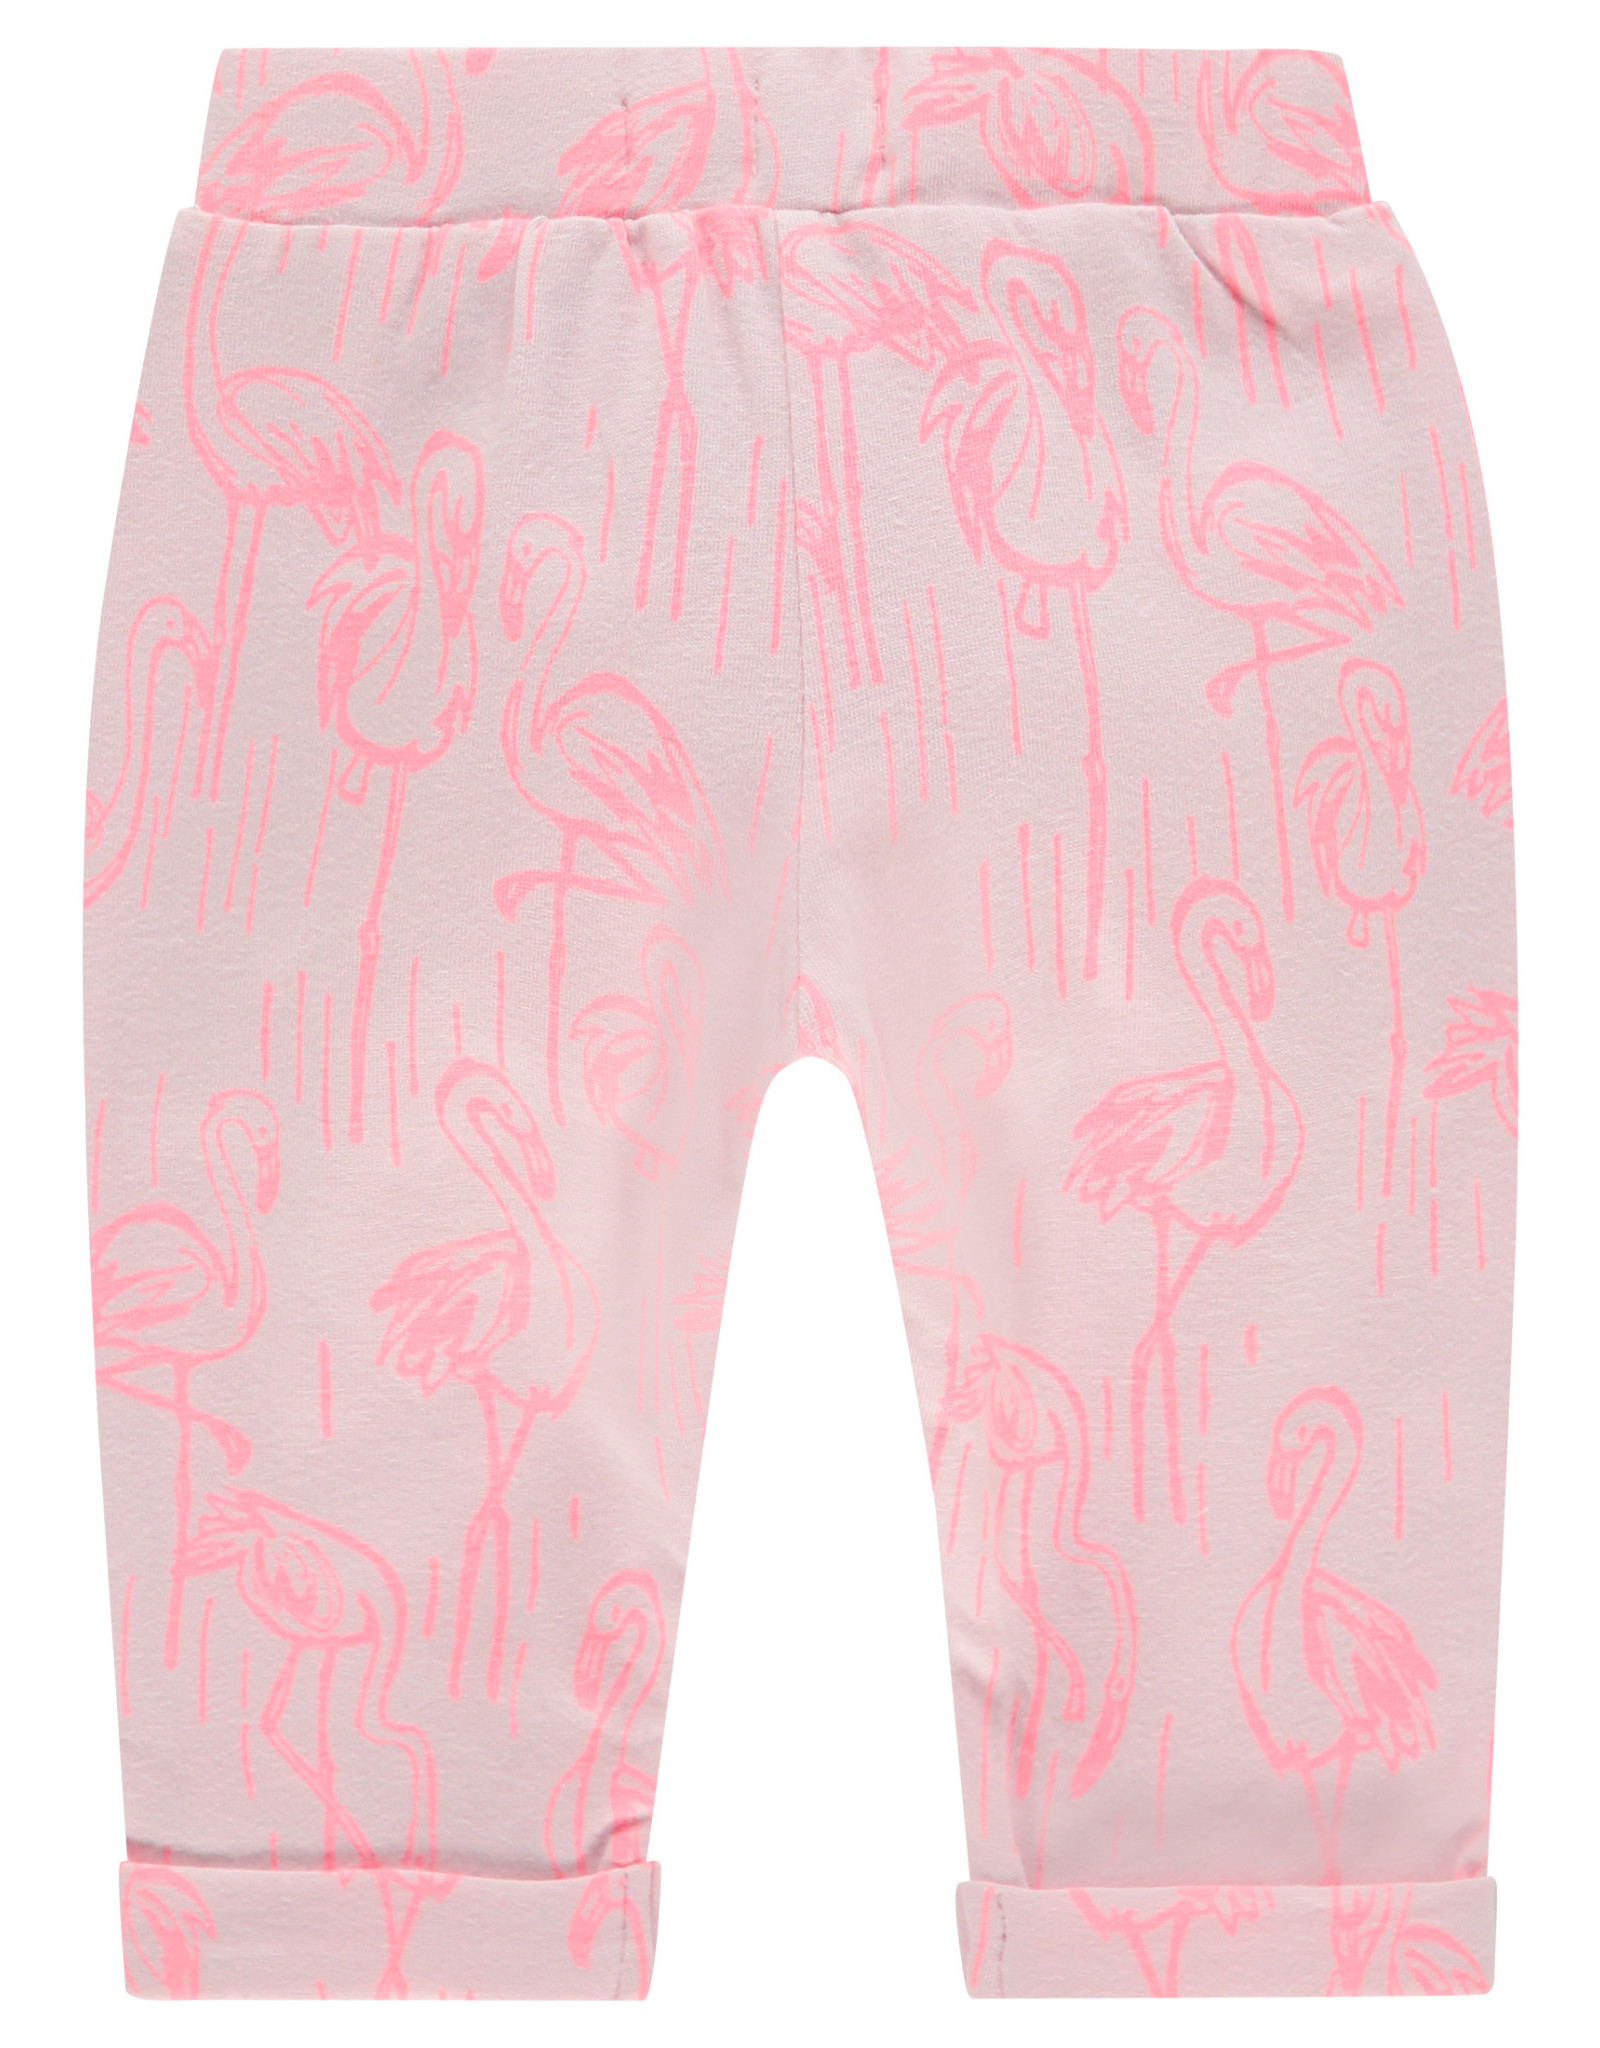 Noppies G Regular fit pants Chatham aop, Cradle Pink